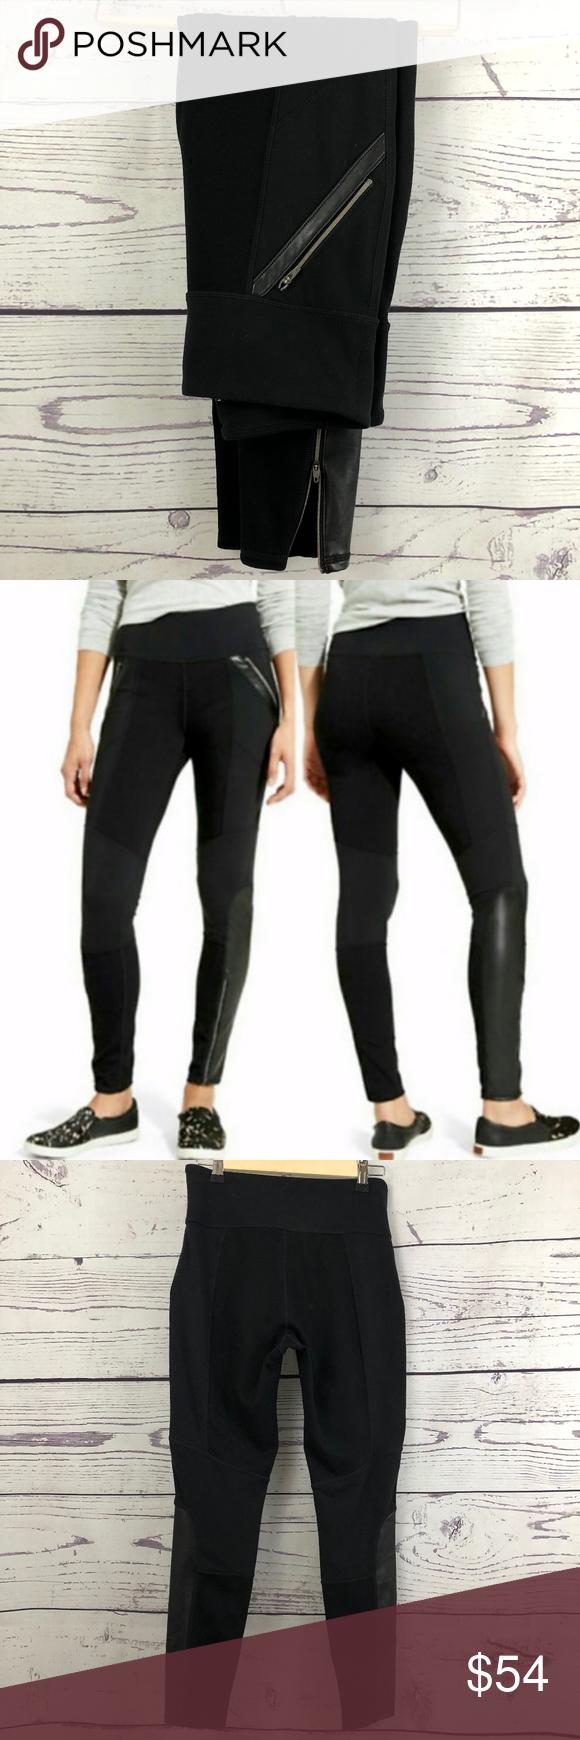 "d6758adf3dff14 ATHLETA Ponte Luxe Moto Faux Leather Leggings Women's M Approximate  Measurements: 27"" Waist Width"